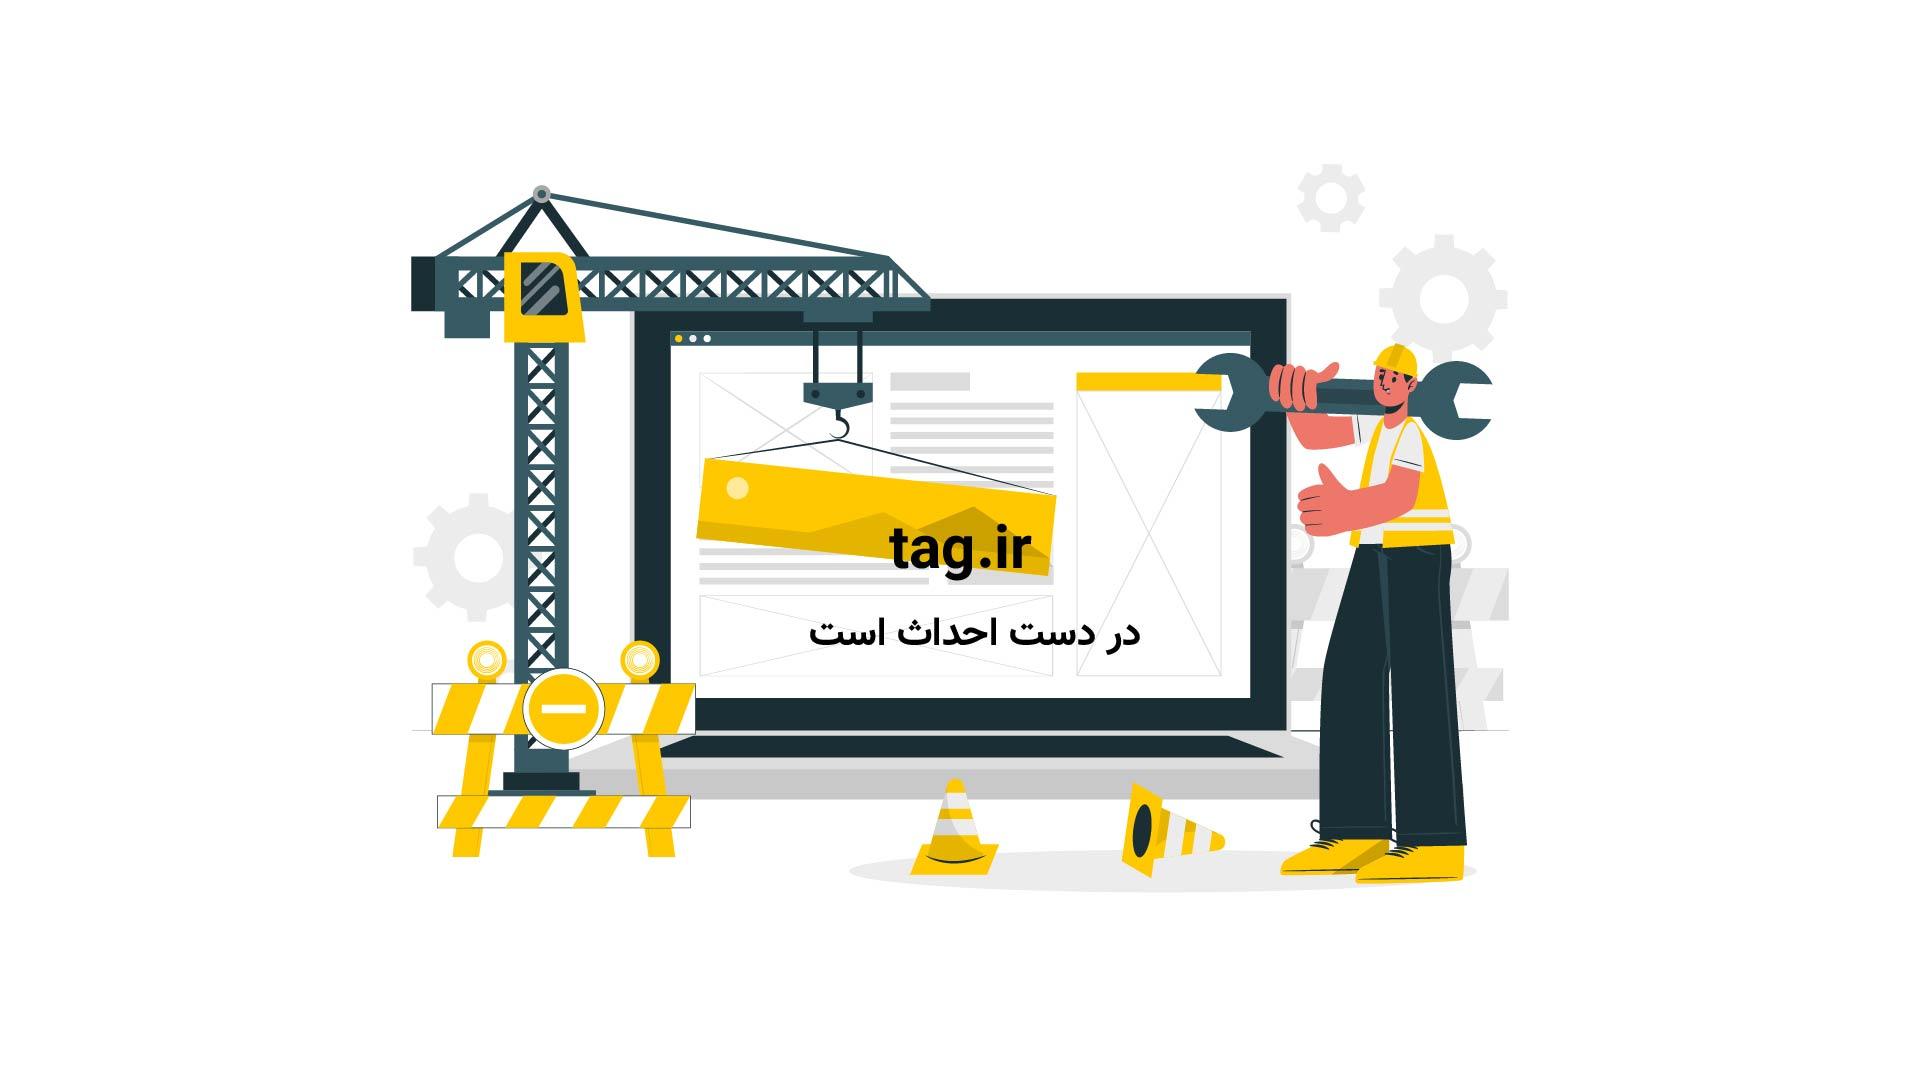 مسجد ملا رستم | تگ